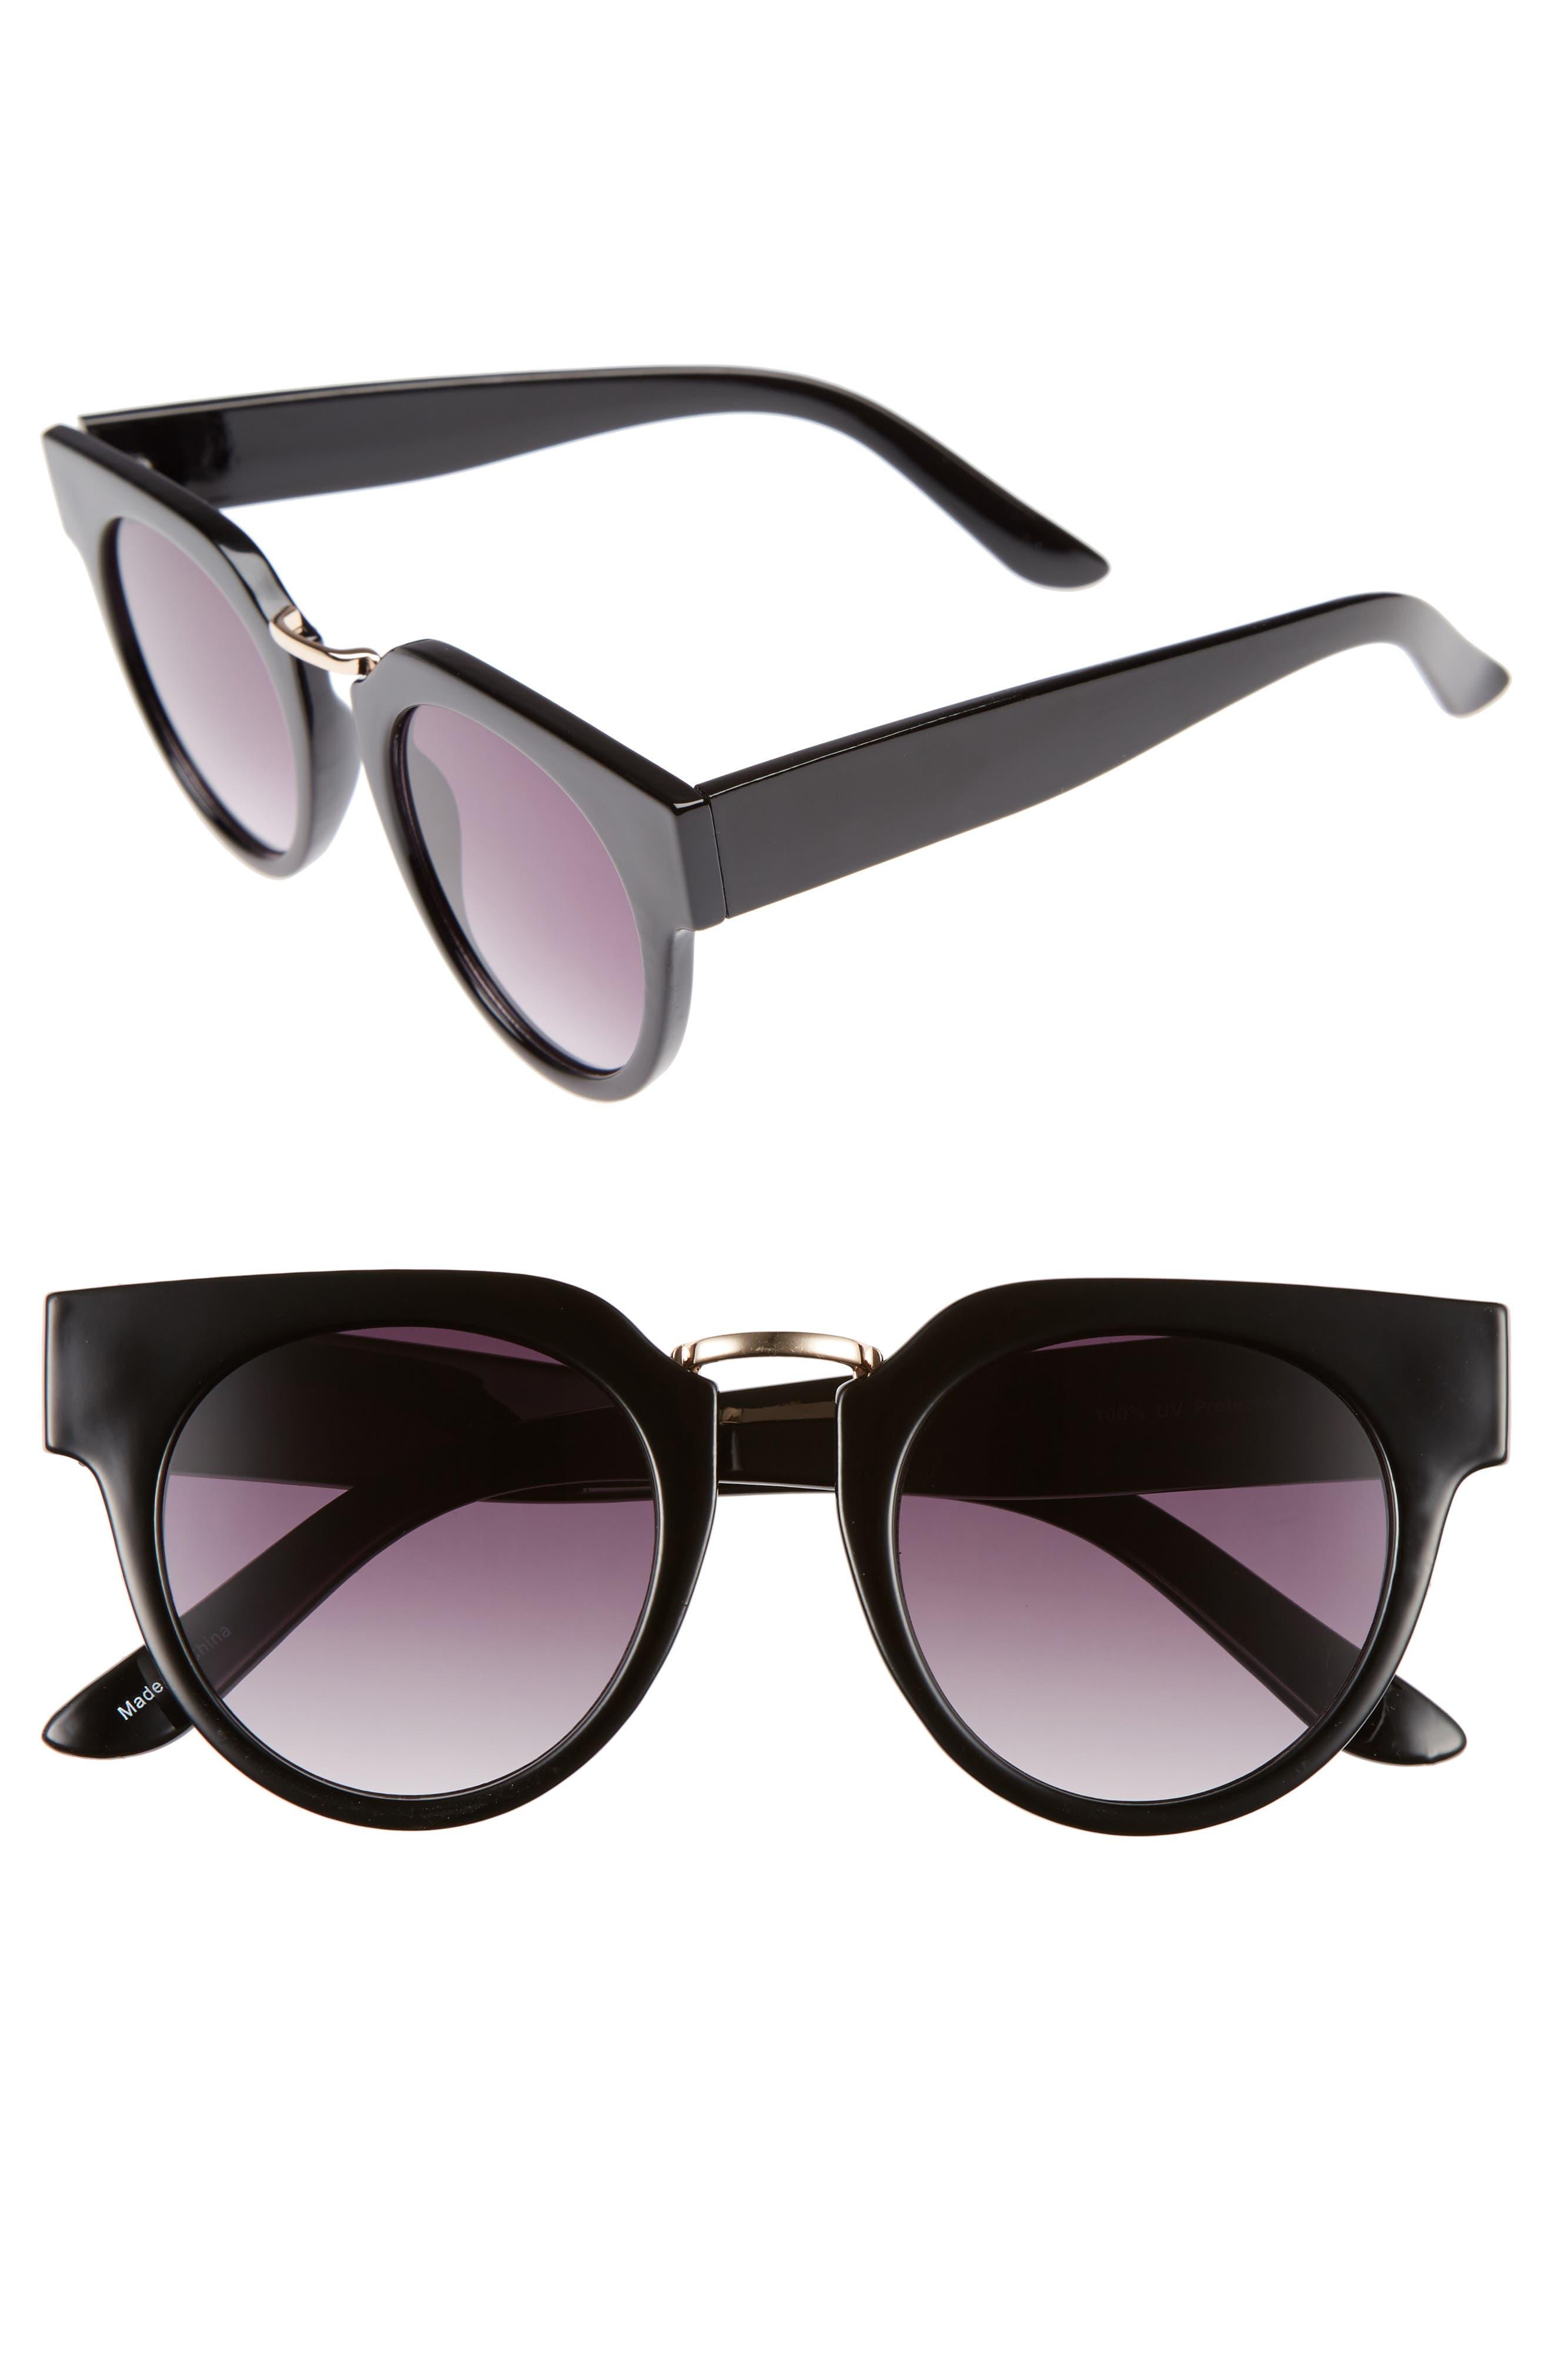 48mm Round Sunglasses,                             Alternate thumbnail 2, color,                             001